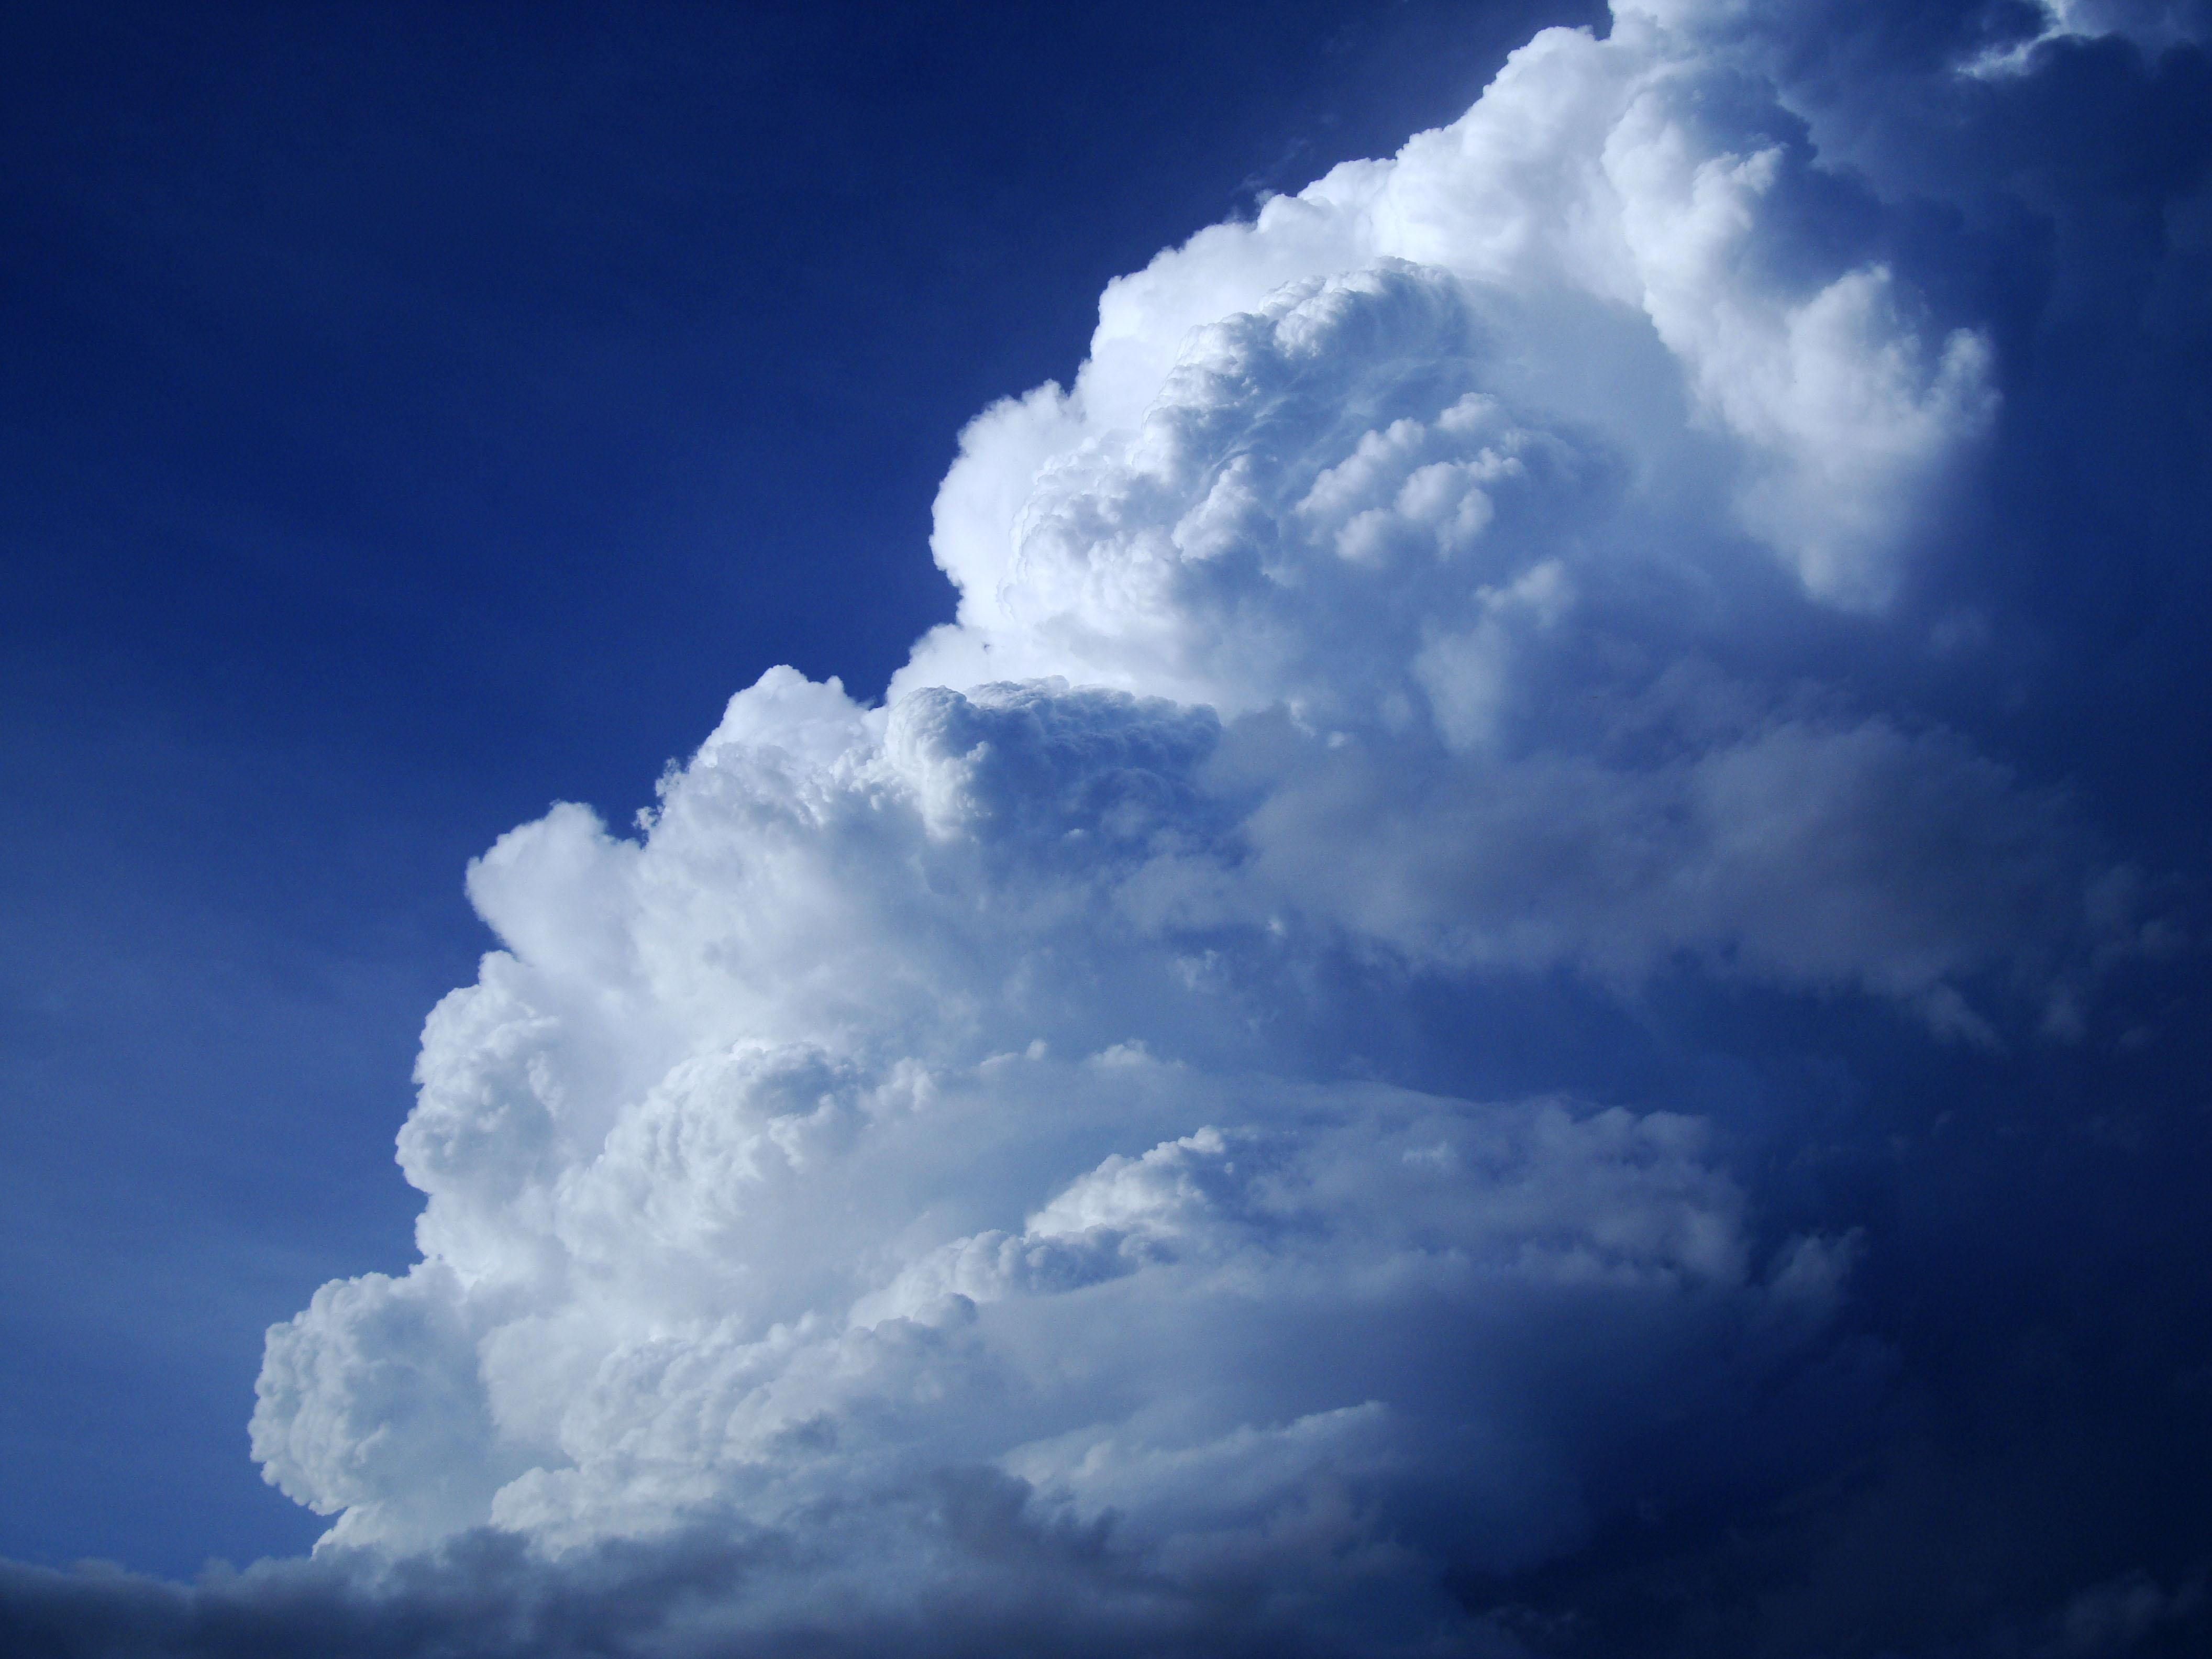 Cumulonimbus Clouds Formations Sky Storms Weather Phenomena 08